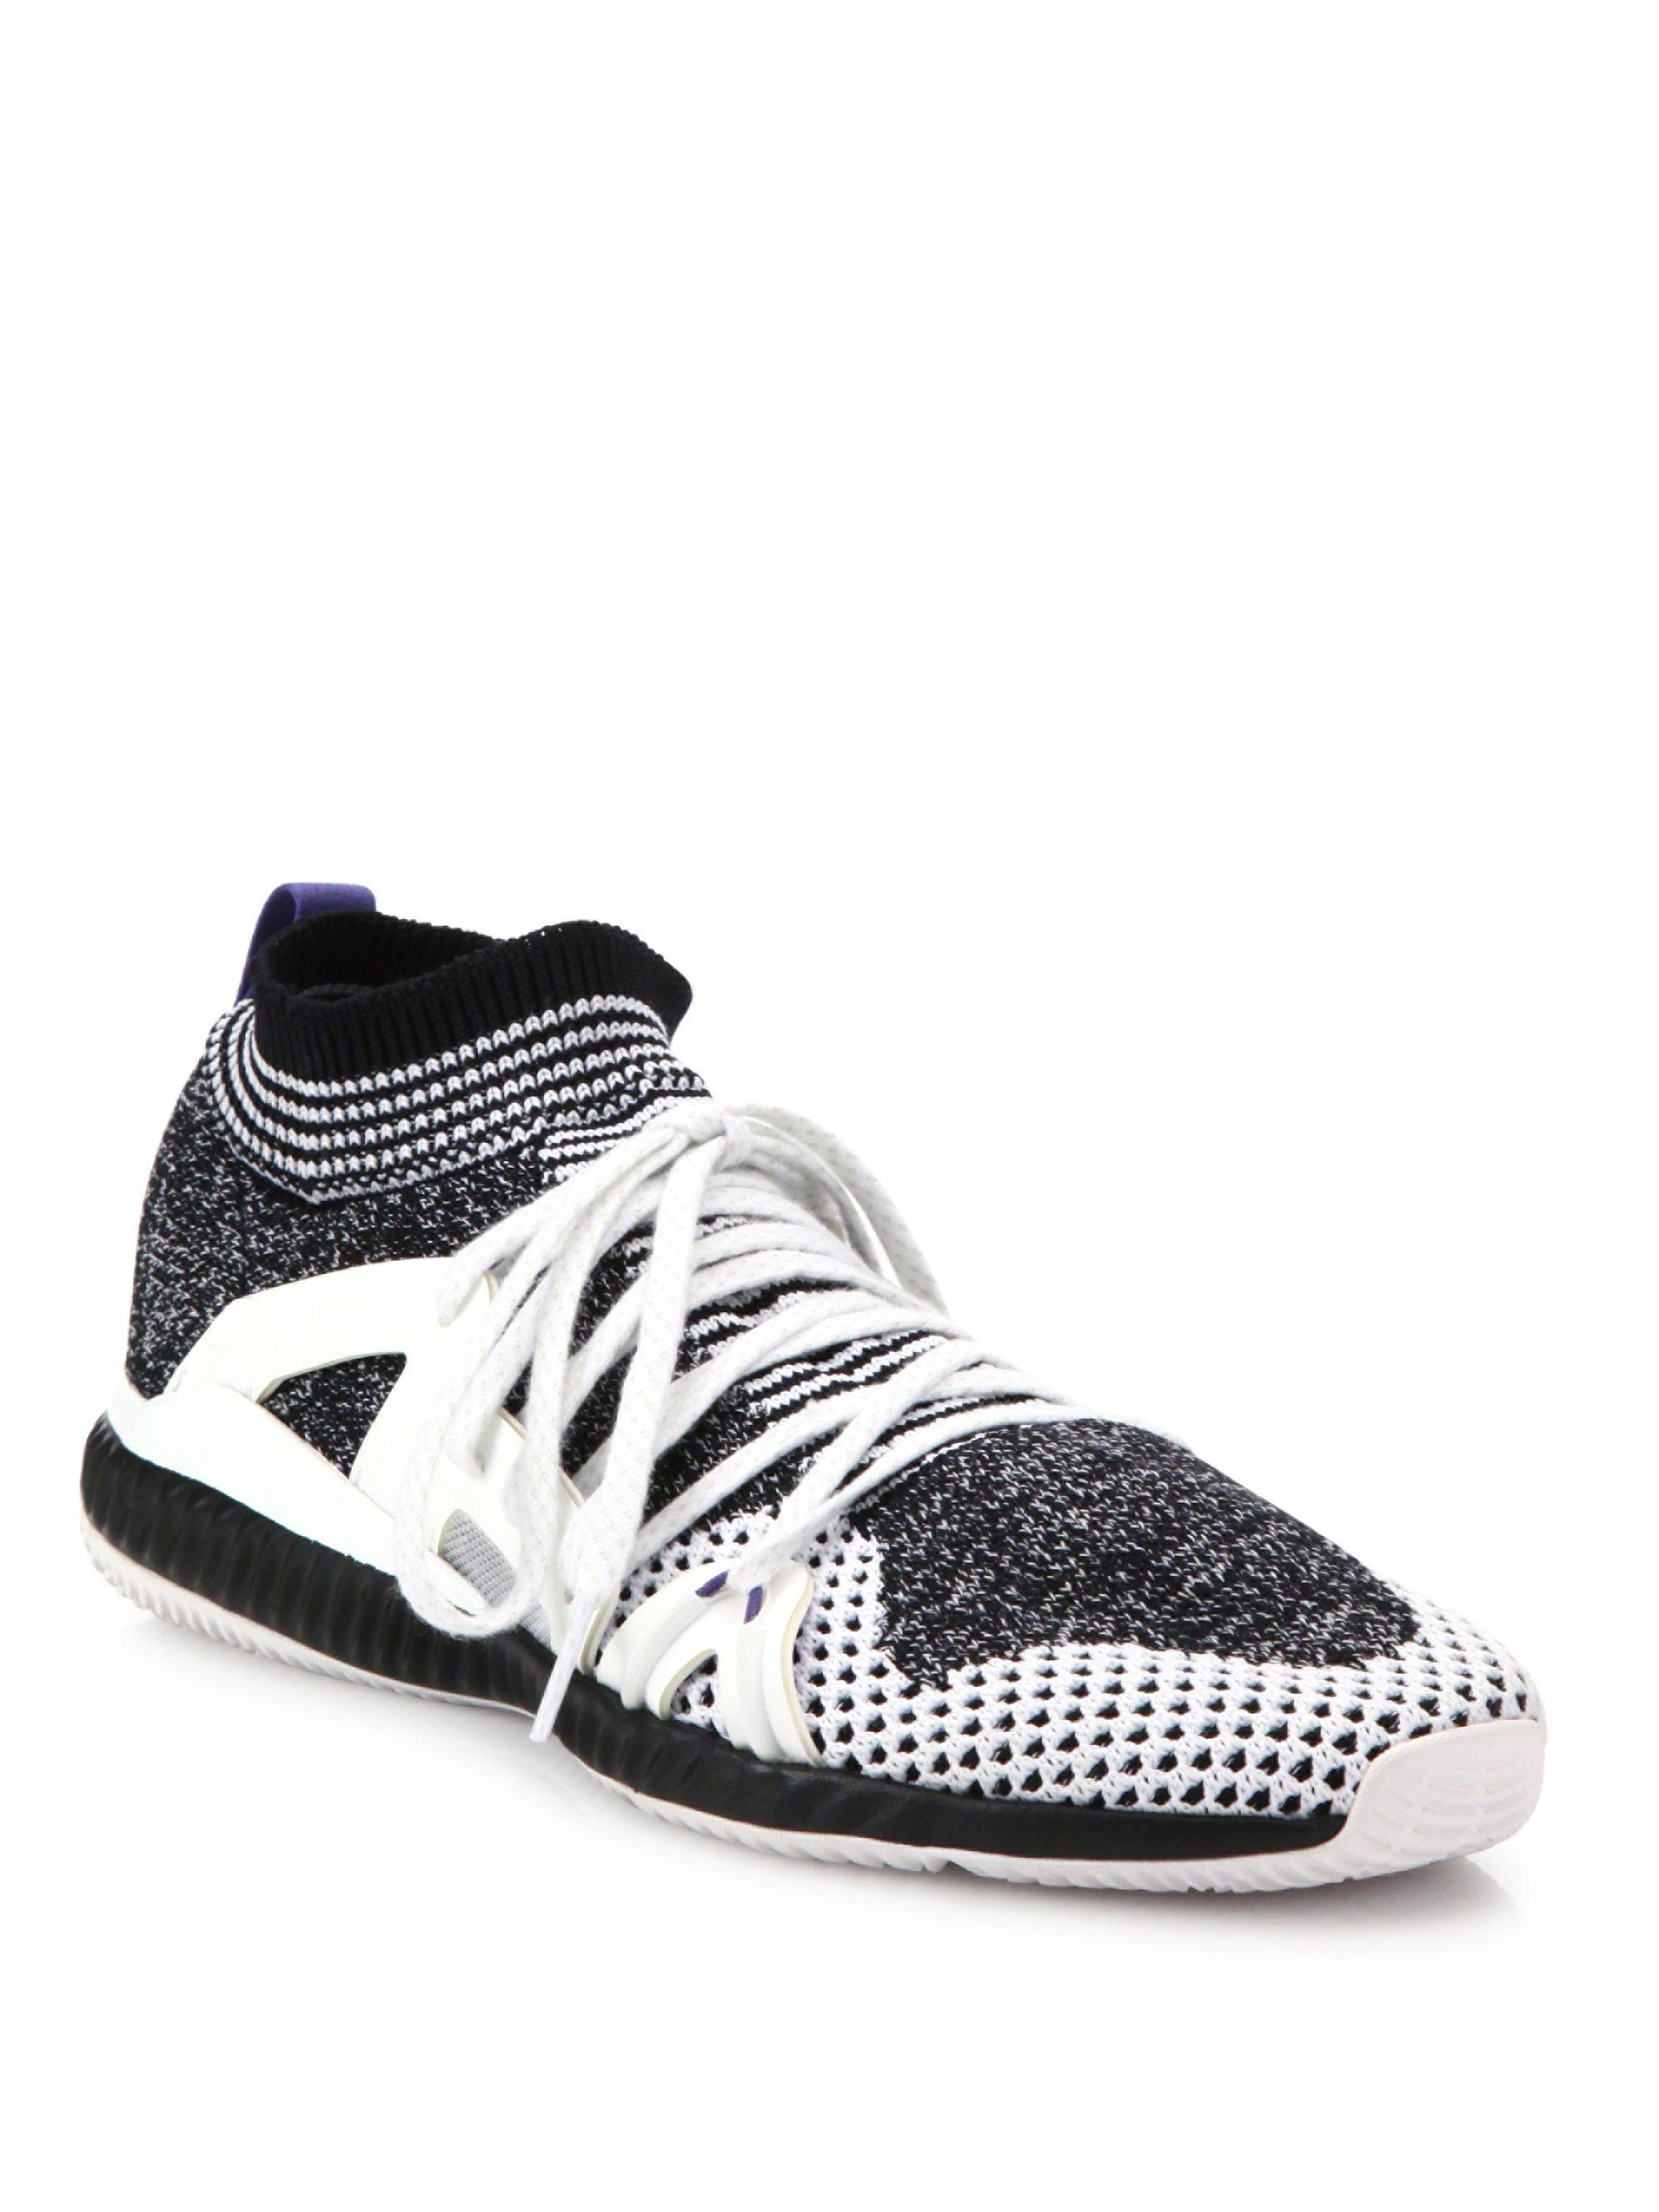 Adidas by Stella McCartney zapatillas Lyst crazymove Bounce Trainer zapatillas McCartney 4954b1